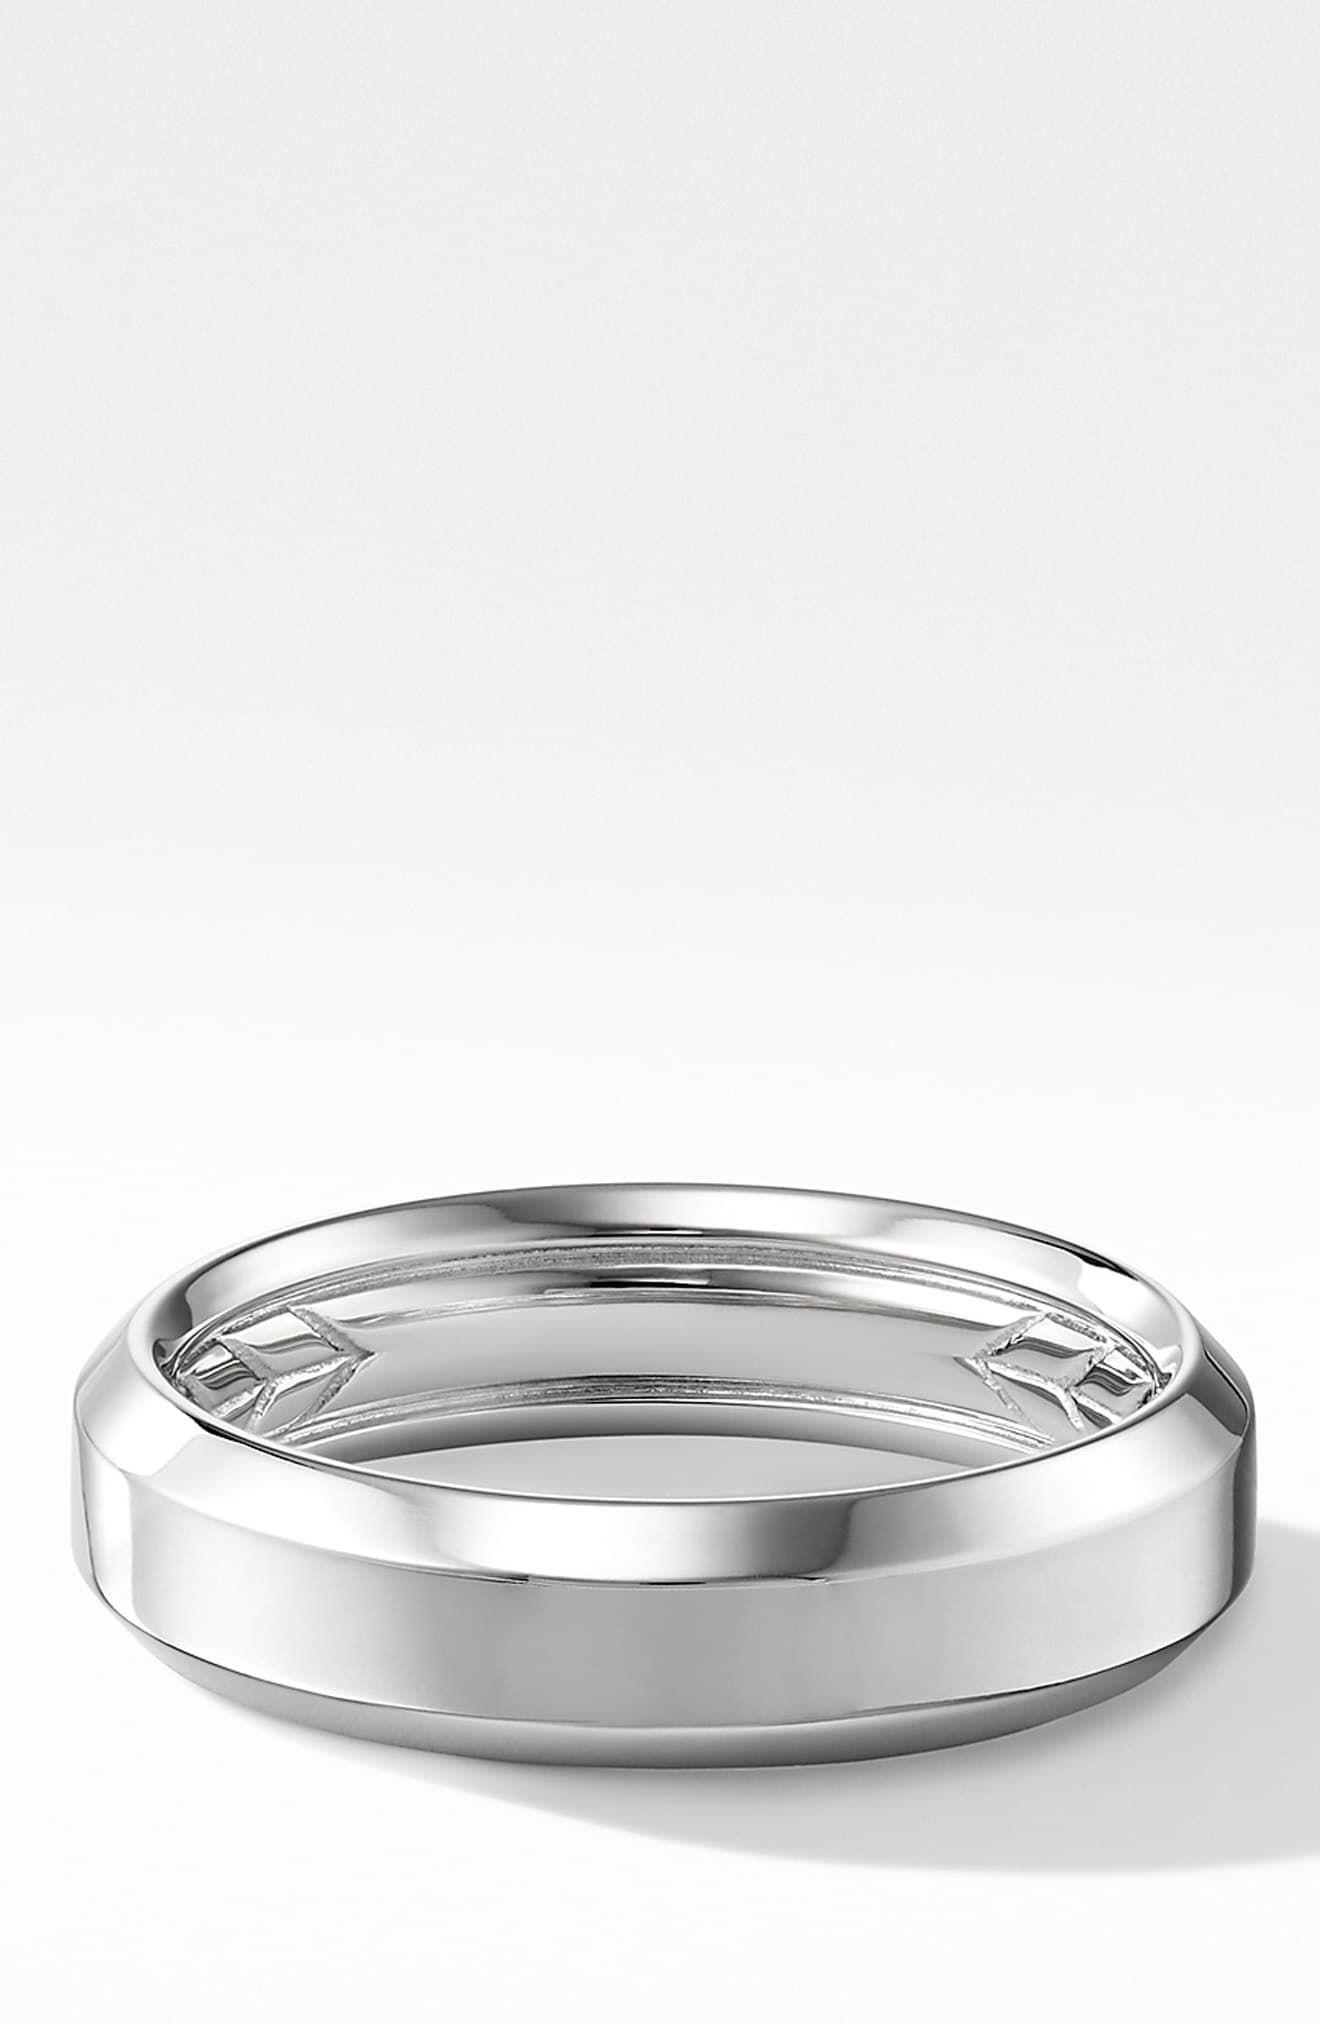 David Yurman 18k Beveled Band Ring Band Rings Rings Jewelry